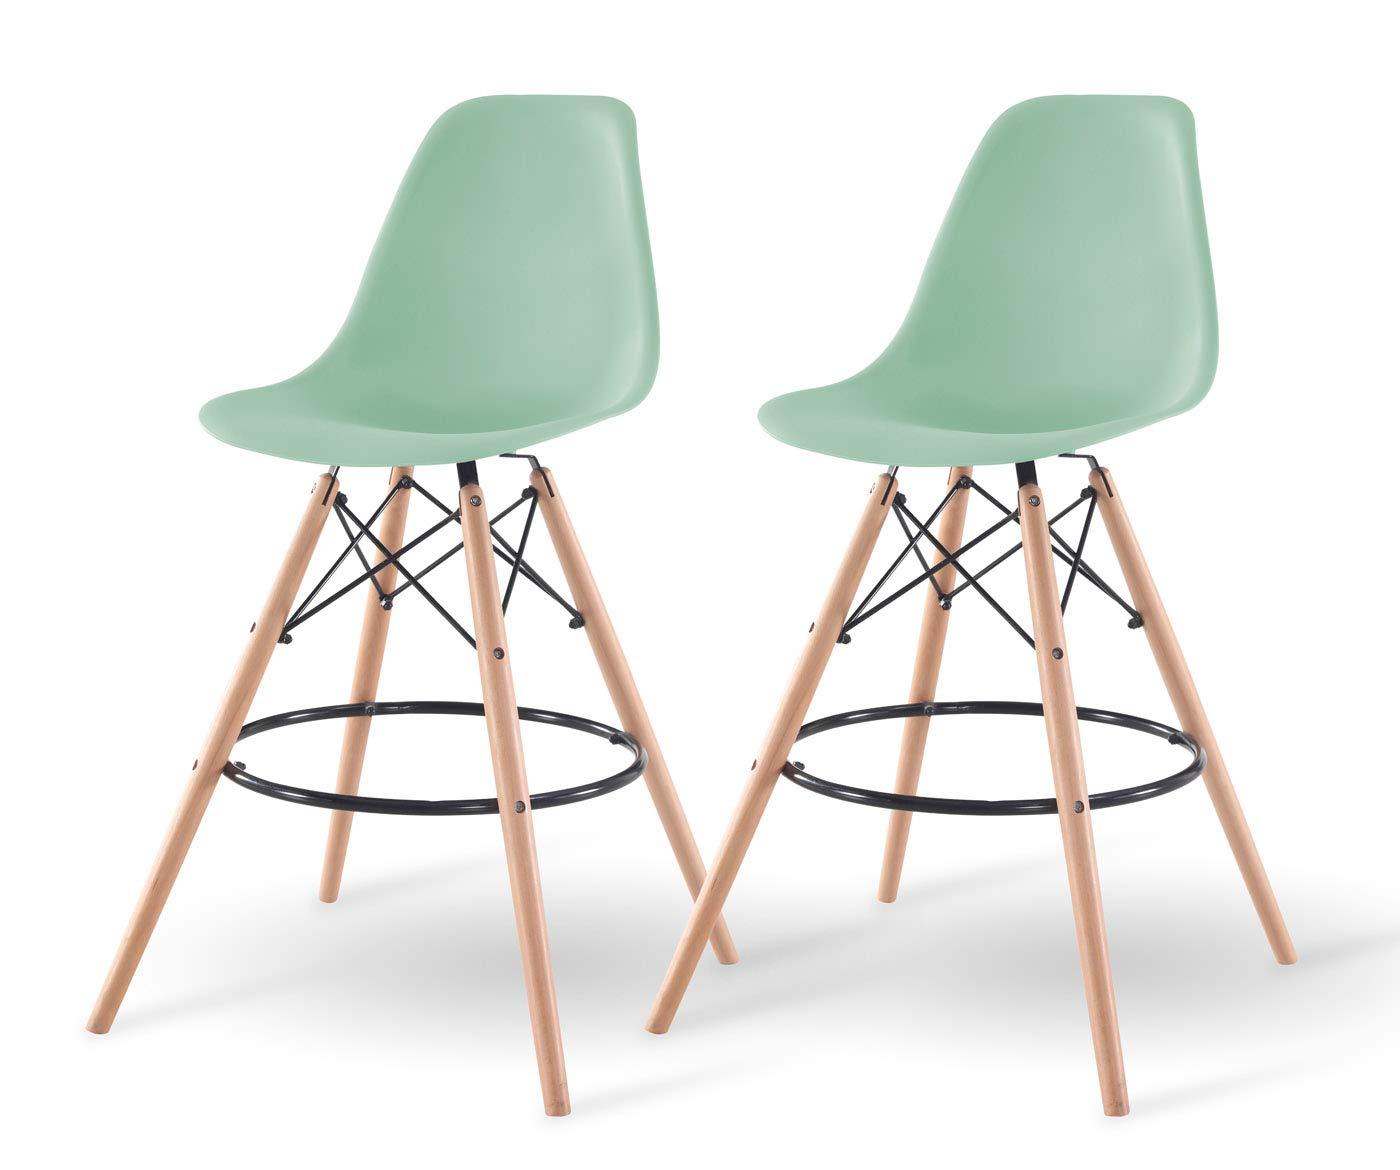 IRIS Mid-Century Modern Shell Barstool with Wood Eiffel Legs, 2 Pack, Mint Green by IRIS USA, Inc.